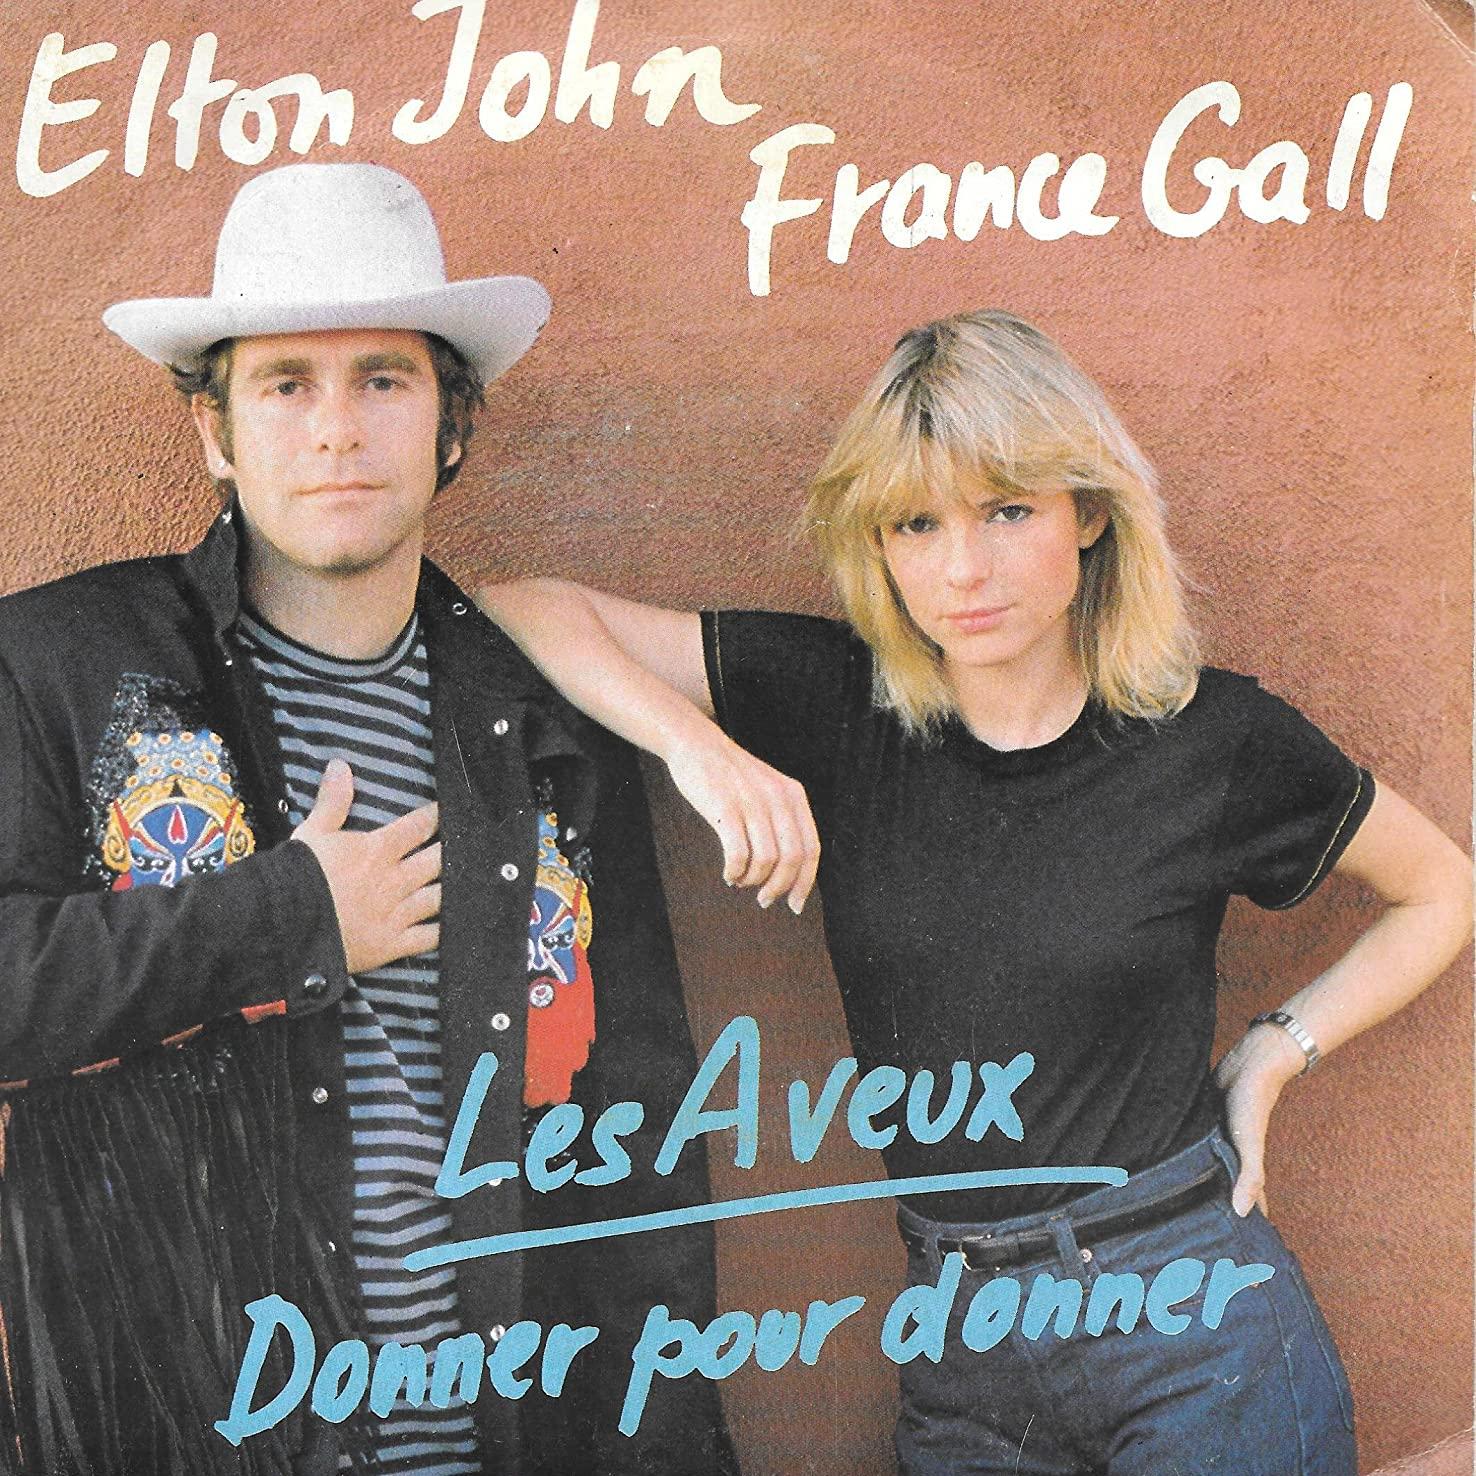 Elton John, France Gall - Donner pour donner